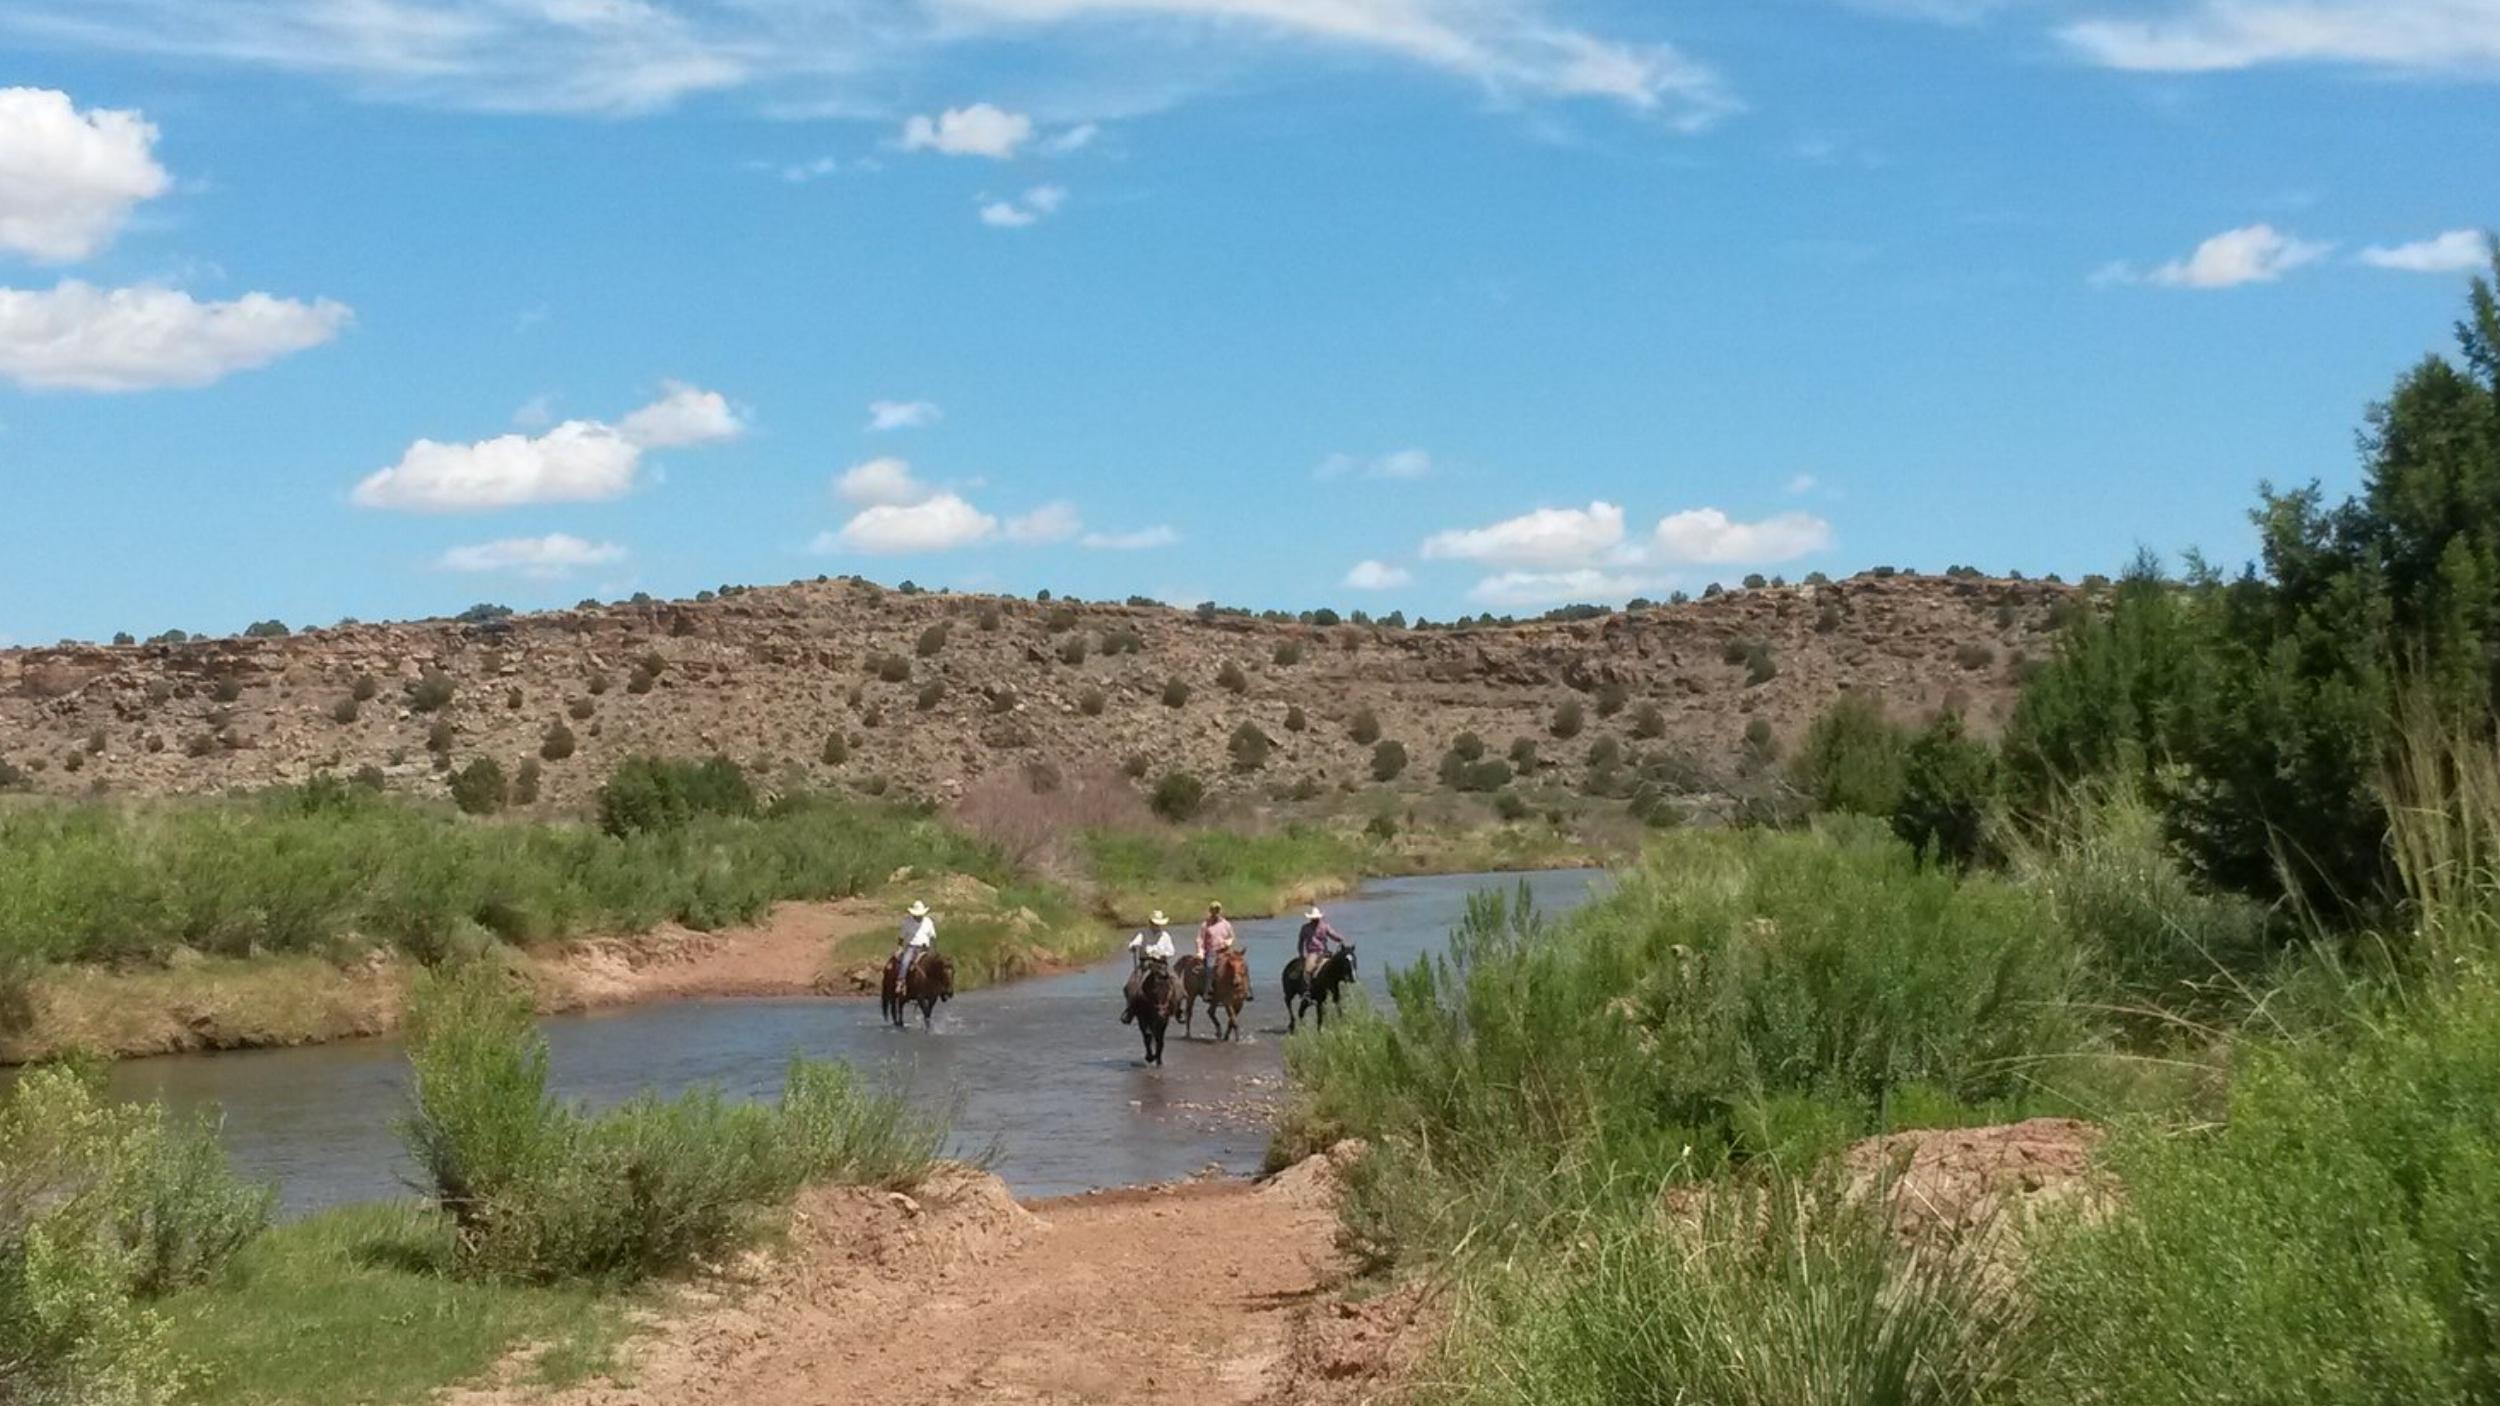 On the way back to the ranch house through the Pecos River.  Auf dem Weg zurück zum Ranchhaus durch den Pecos River.